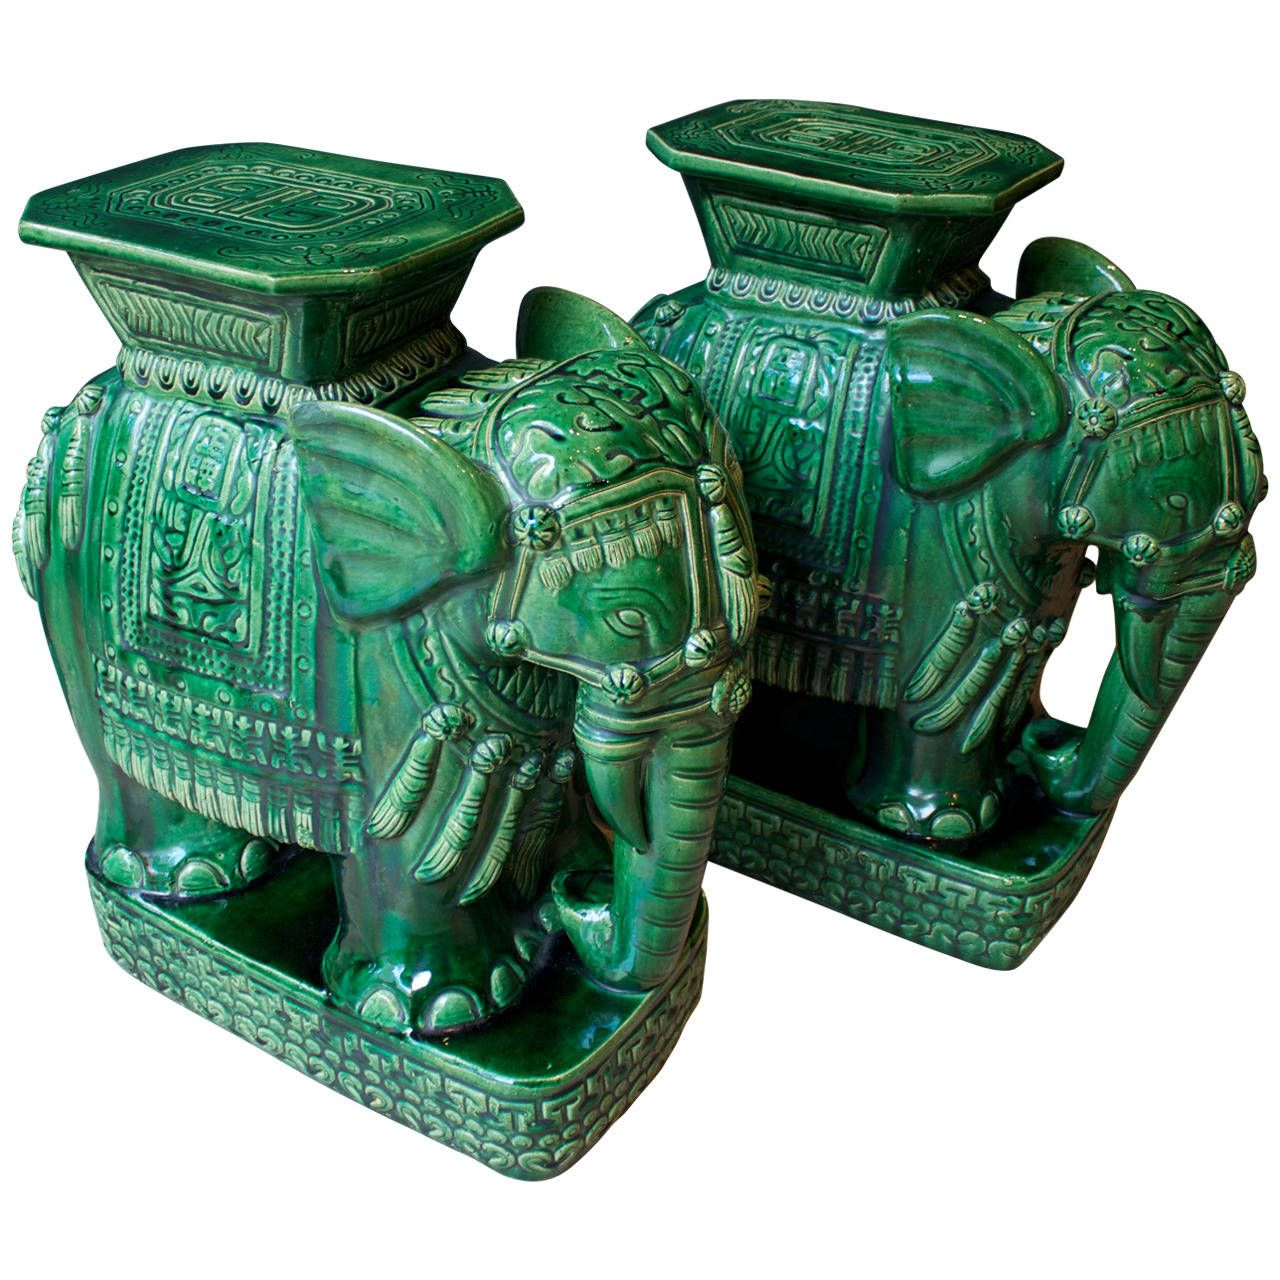 Amazing Pair Of Mid Century Elephant Emerald Green Glazed Ceramic Unemploymentrelief Wooden Chair Designs For Living Room Unemploymentrelieforg